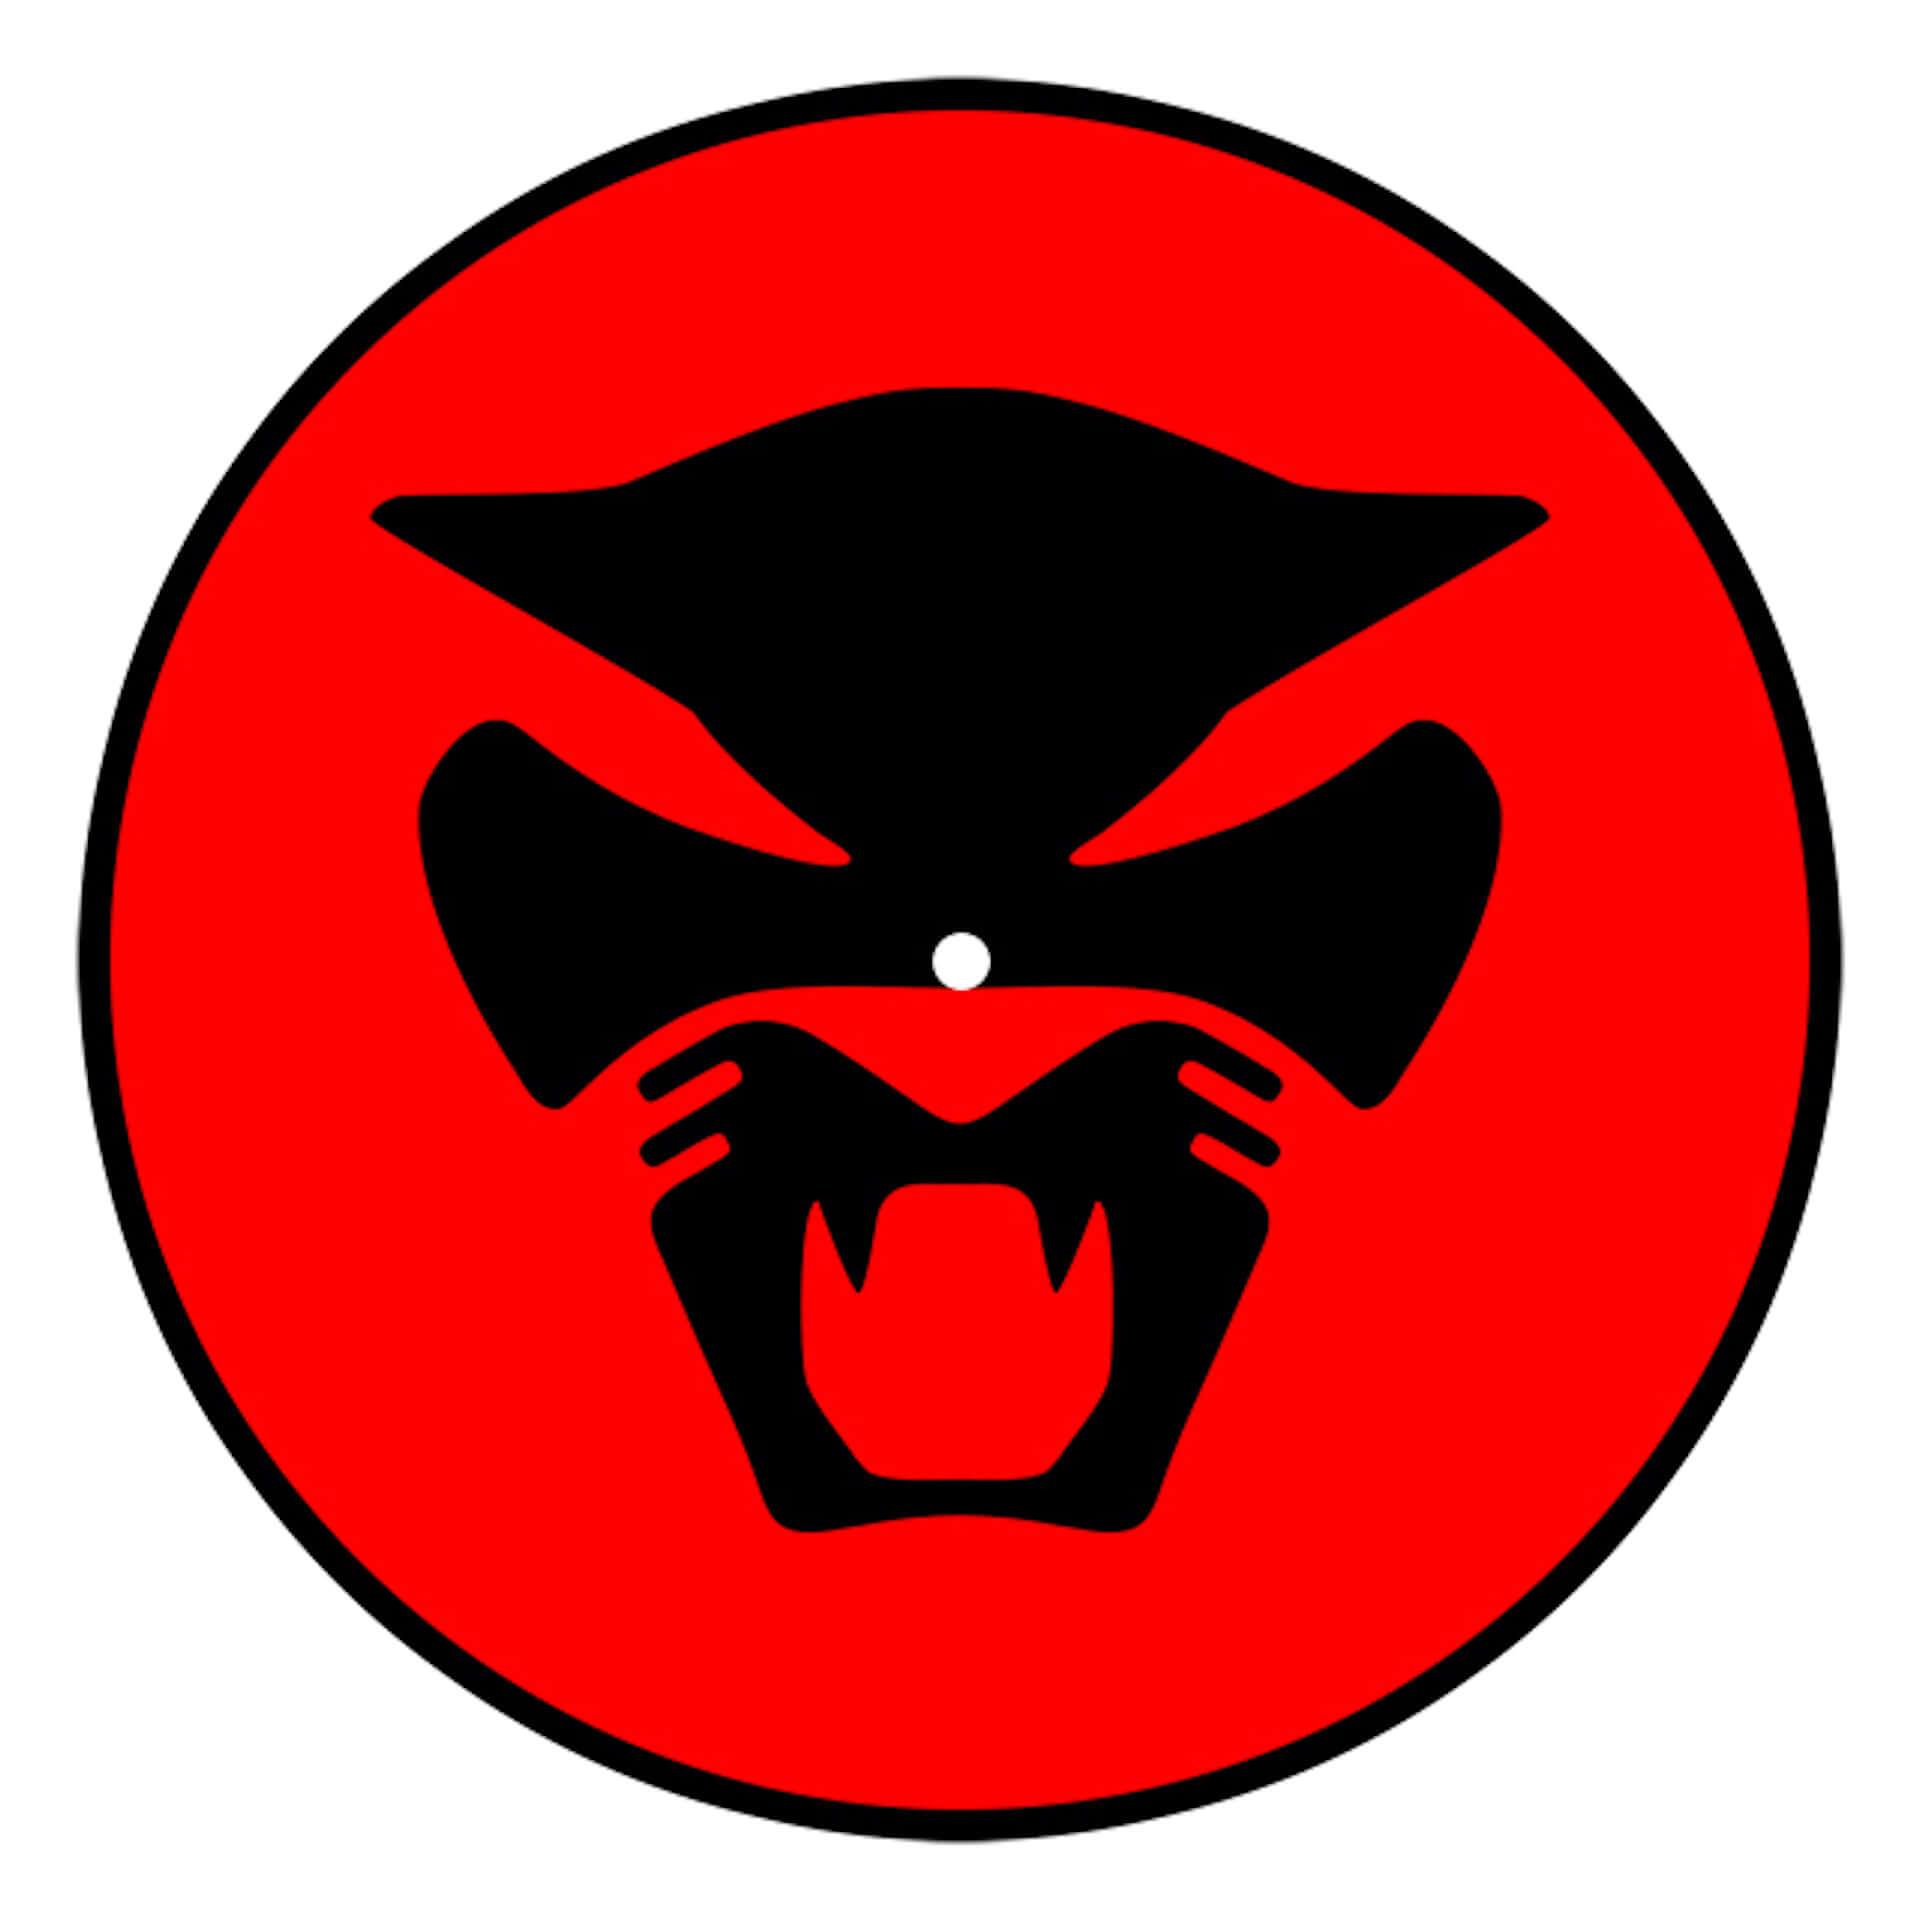 "Thundercatの大ヒットシングル""Dragonball Durag""のリミックスバージョンが公開!SminoとGuapdad 4000が参加 music2000826_thundercat_11-1920x1920"